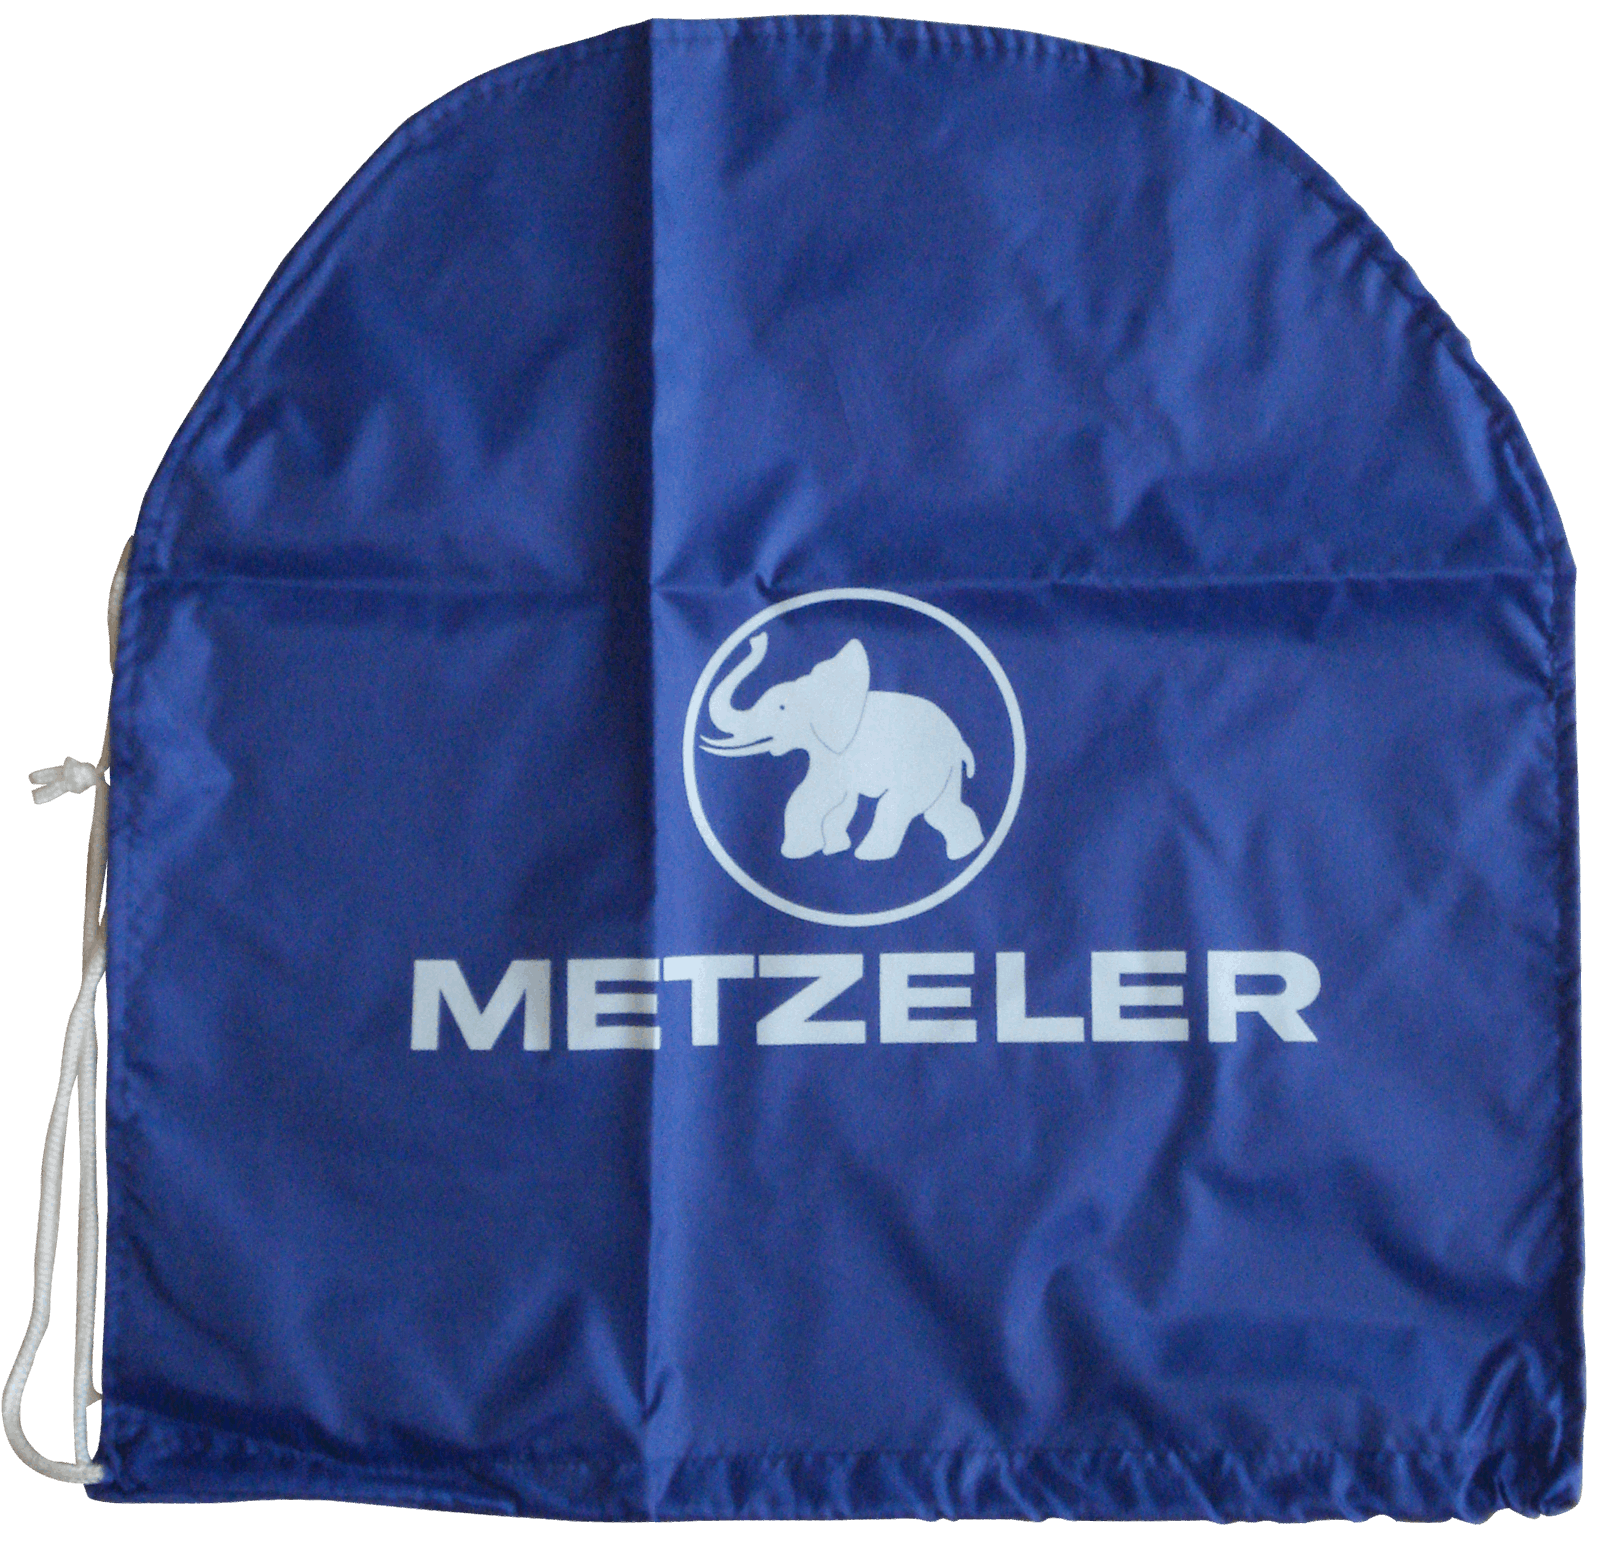 Beutel Metzeler (Copy)